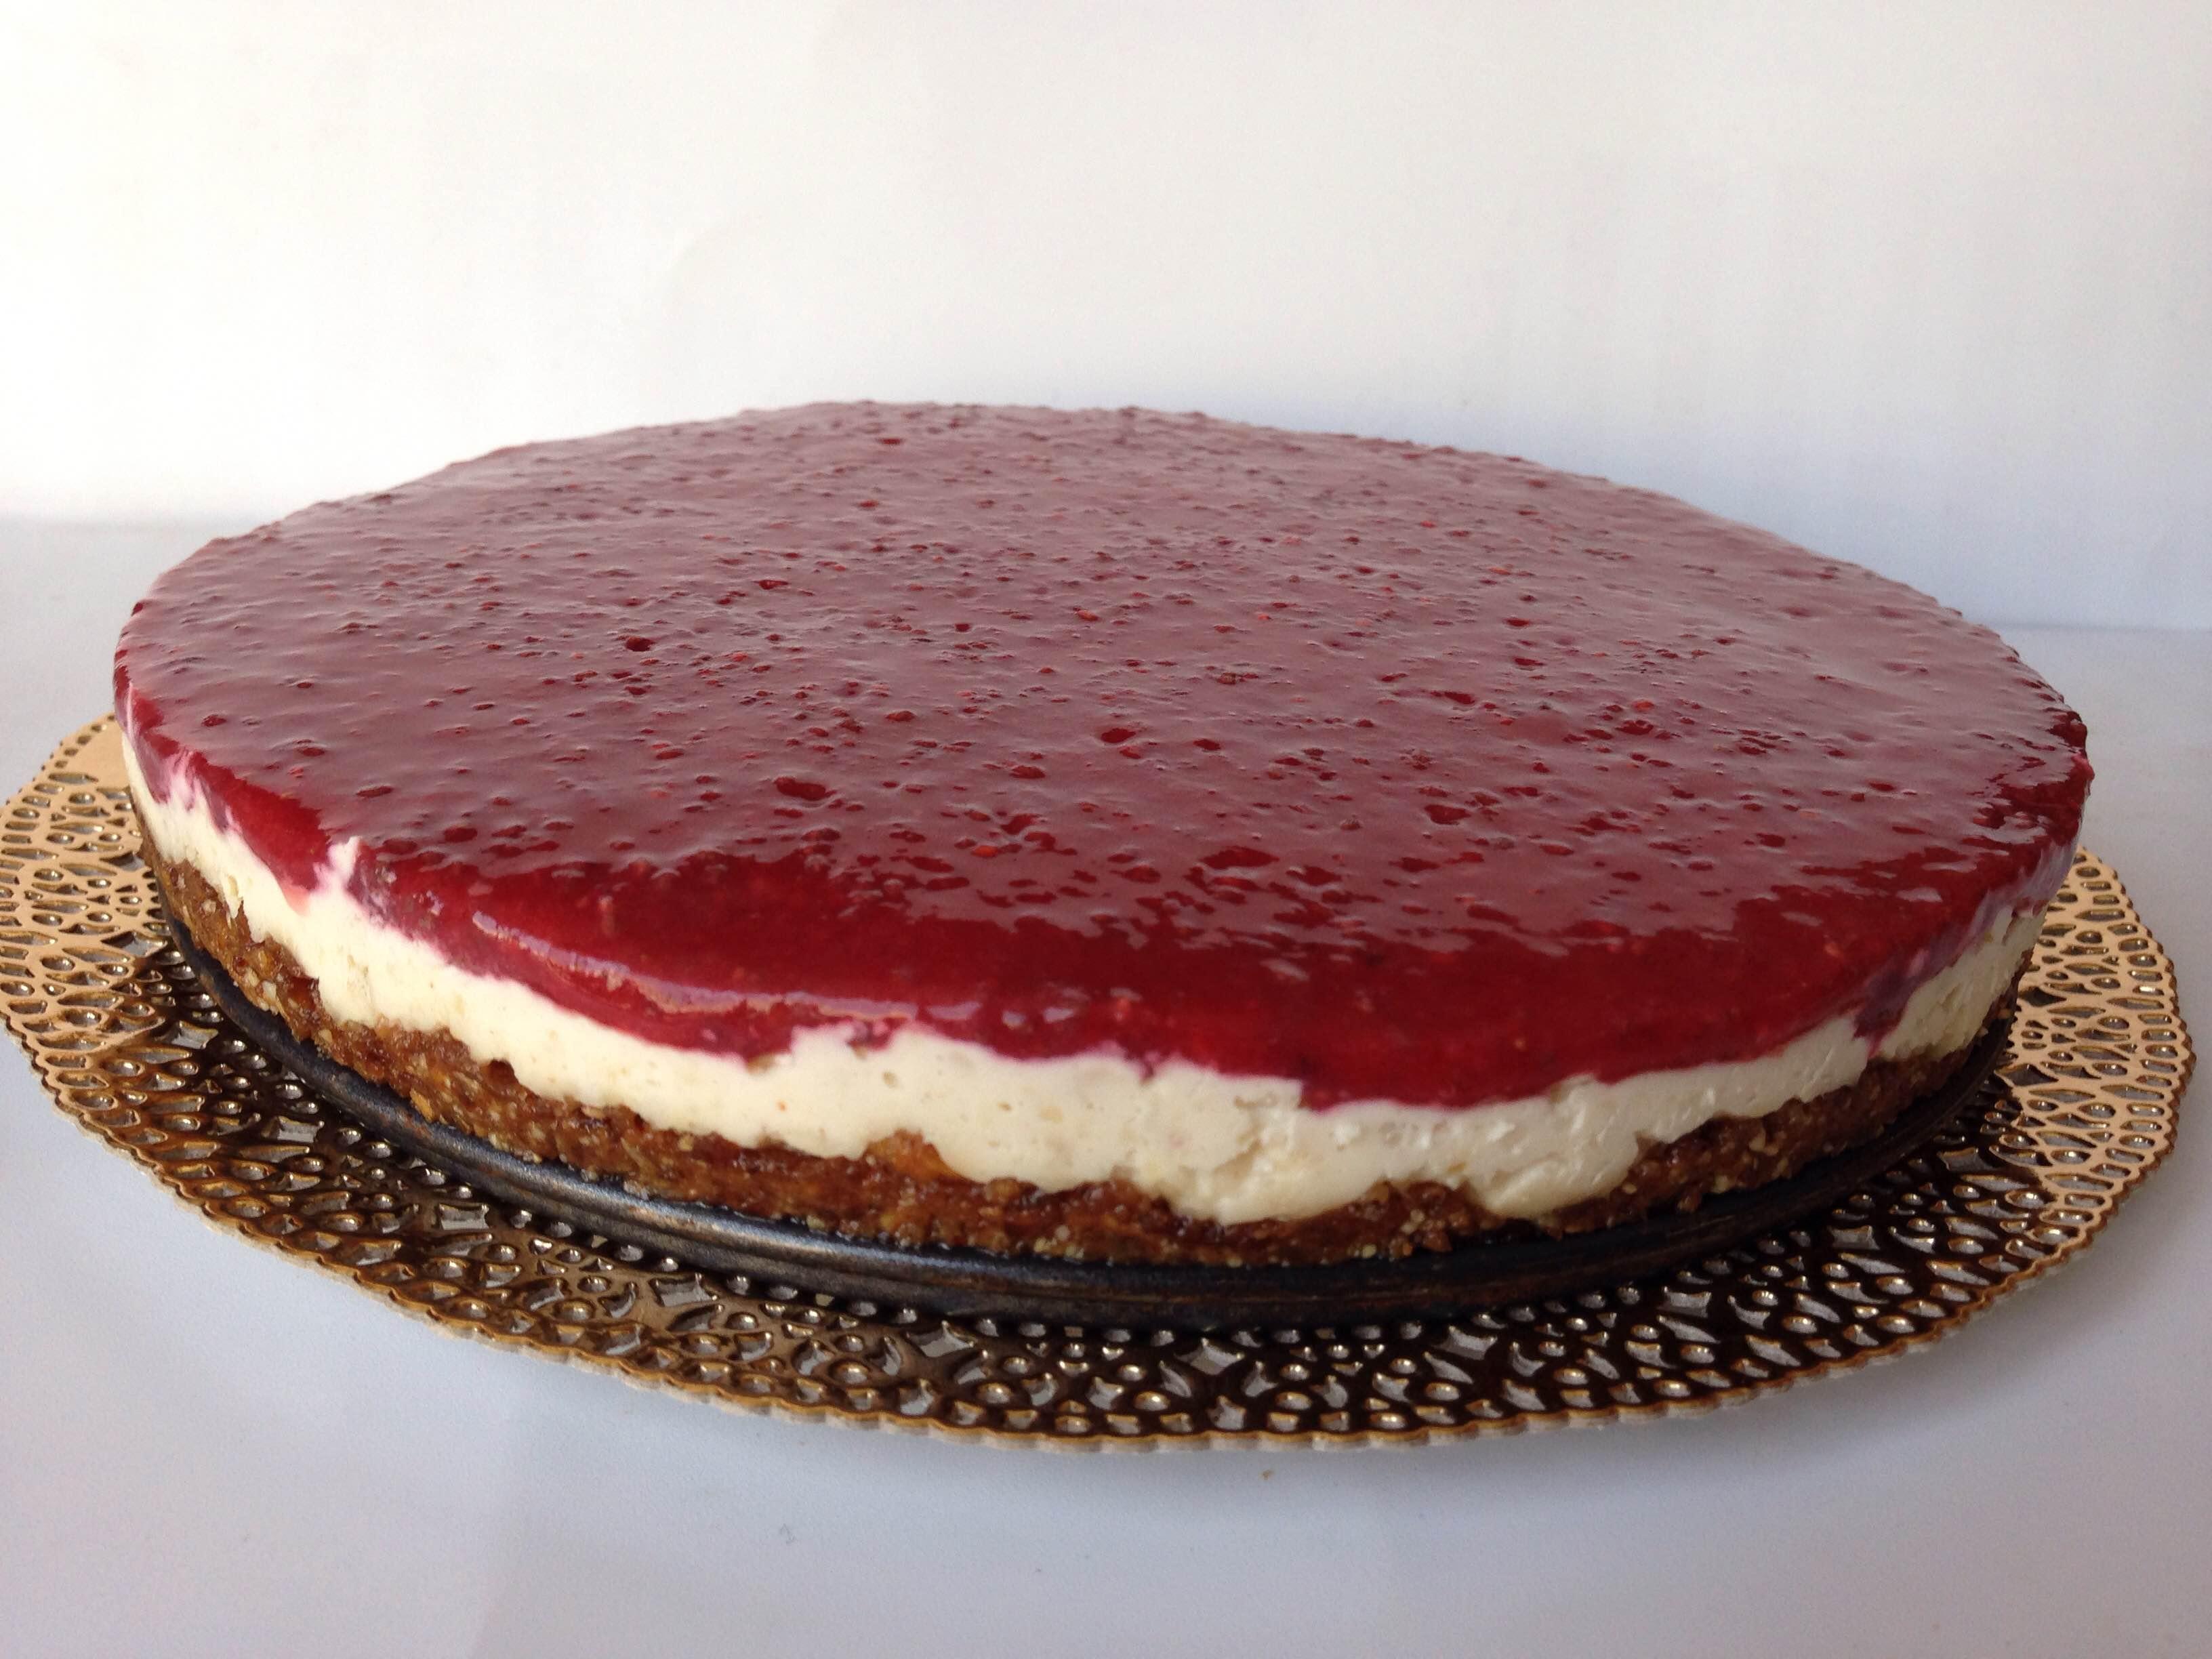 Vegan cheesecake de caju, côco e lima